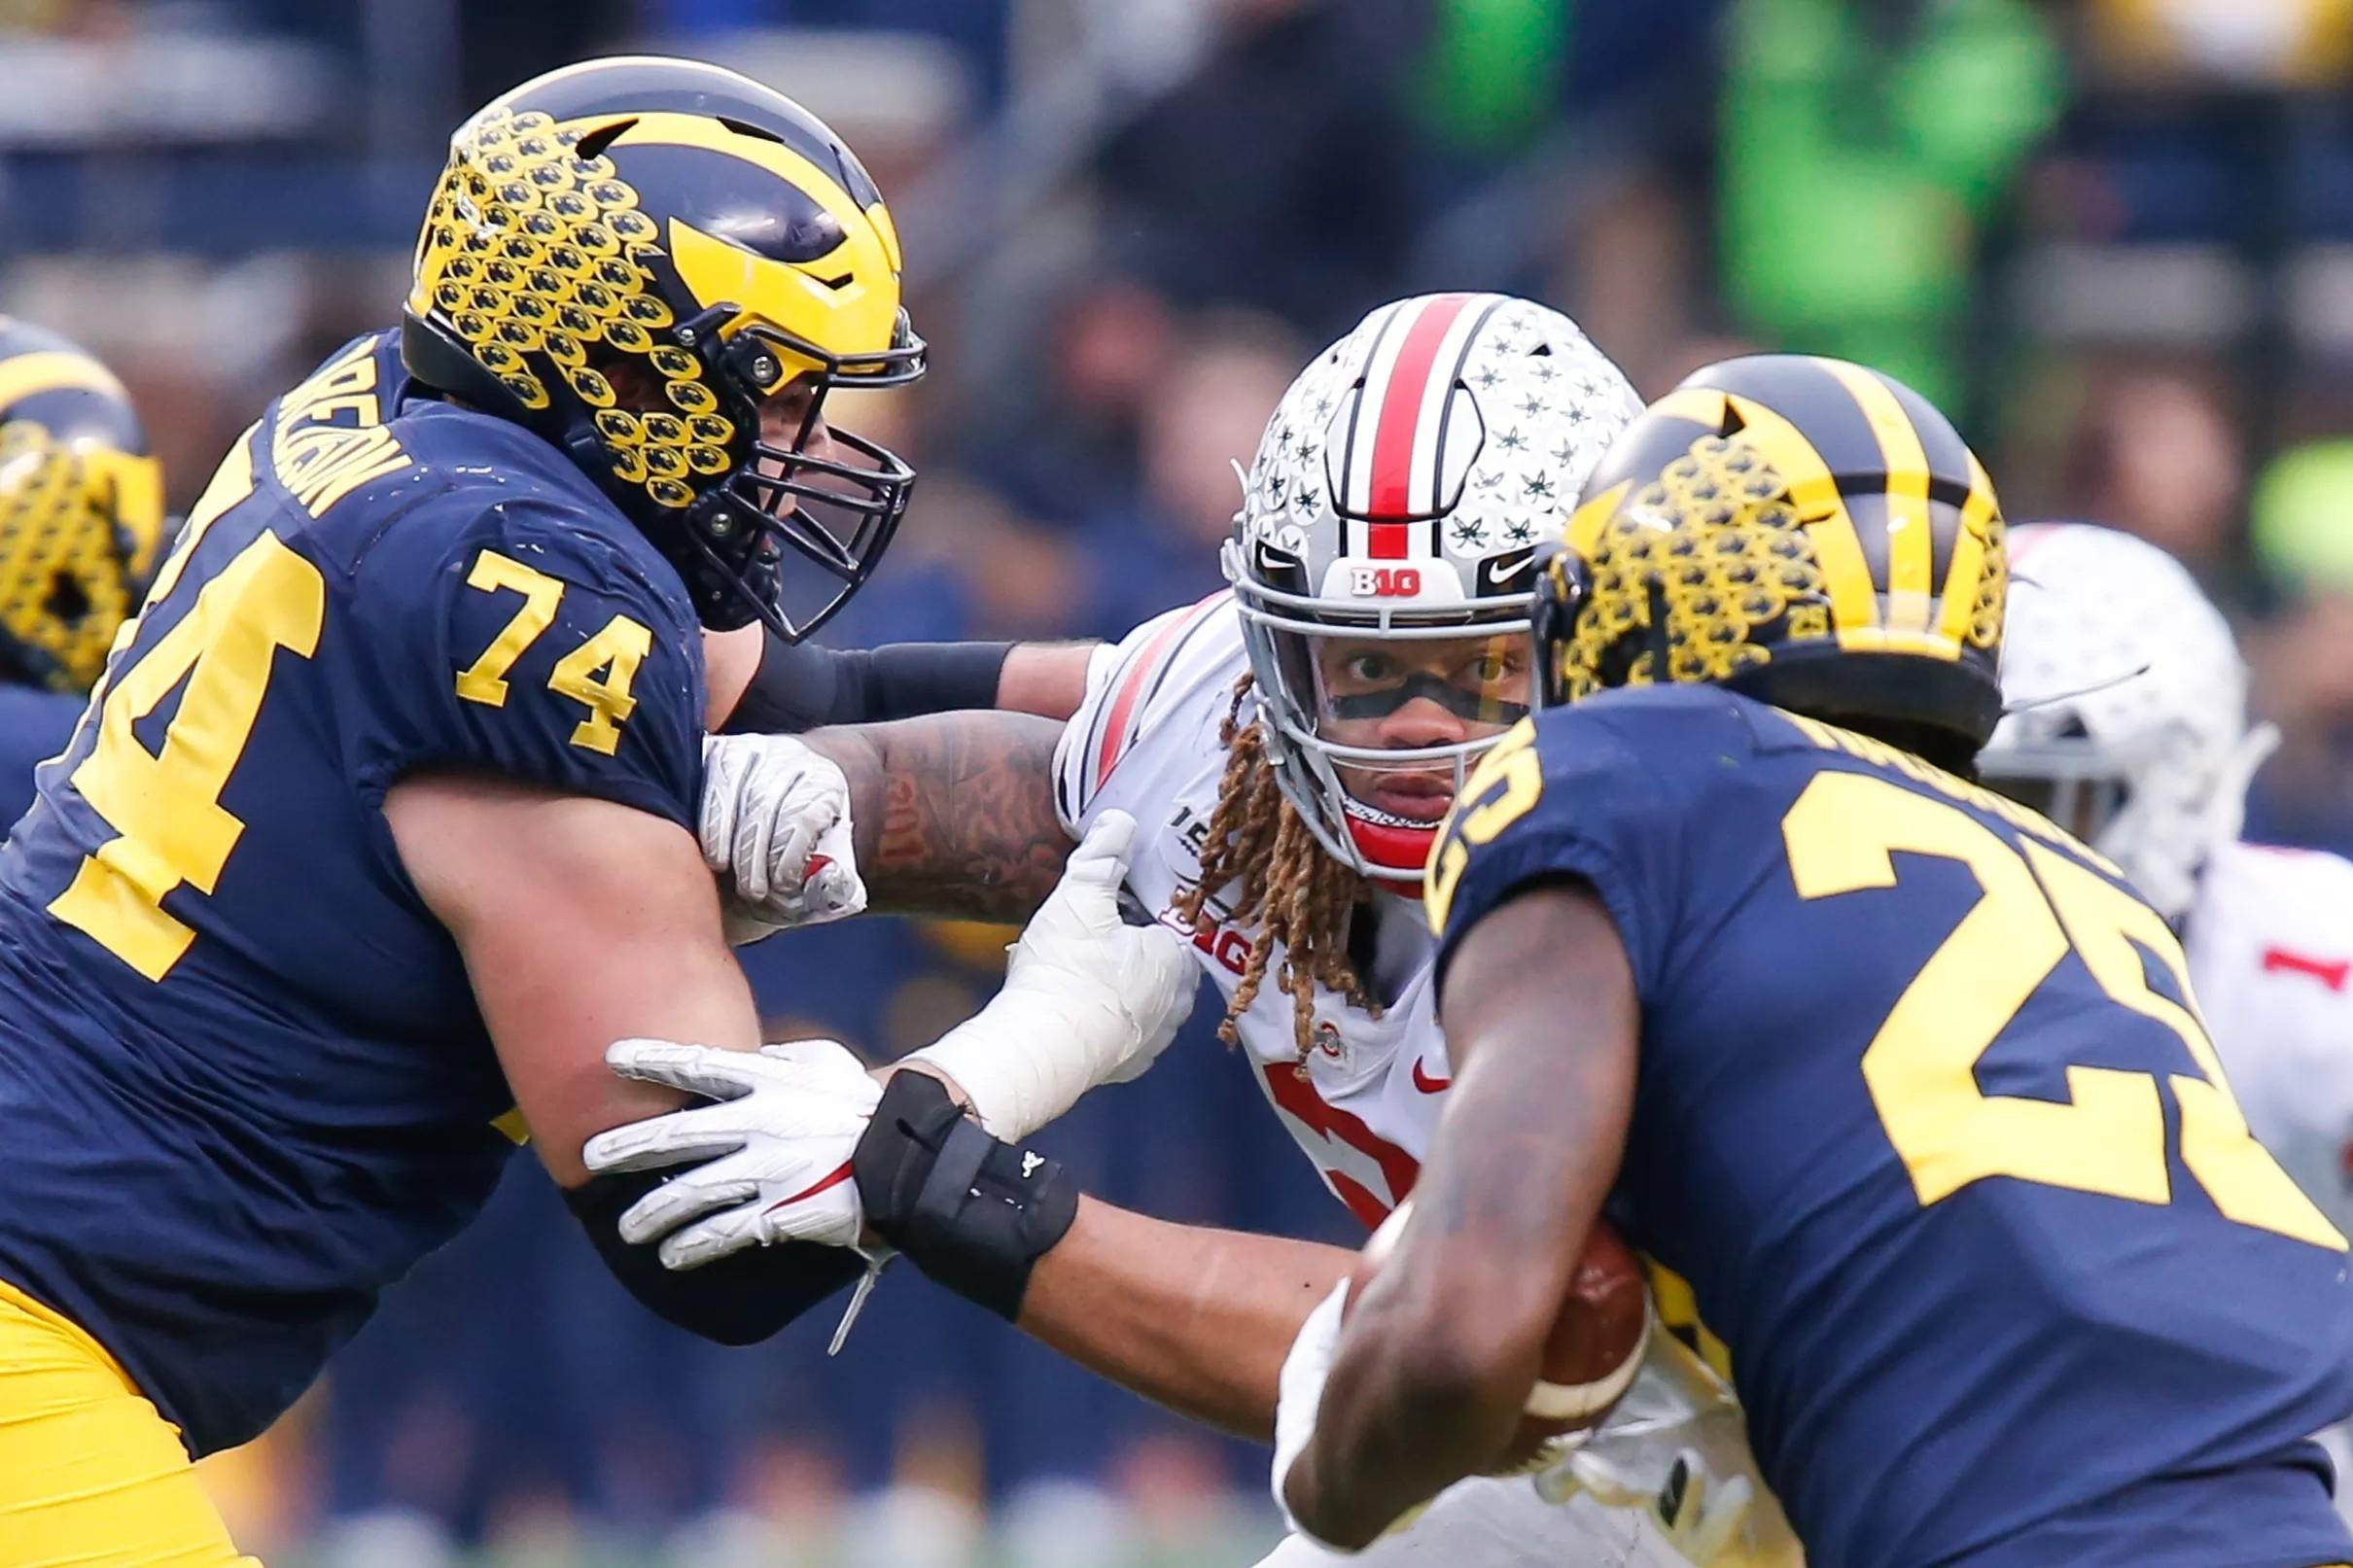 Michigan Recruiting Roundup: Recruit Announces Commitment Date-Rut Predictions For Michigan 2021